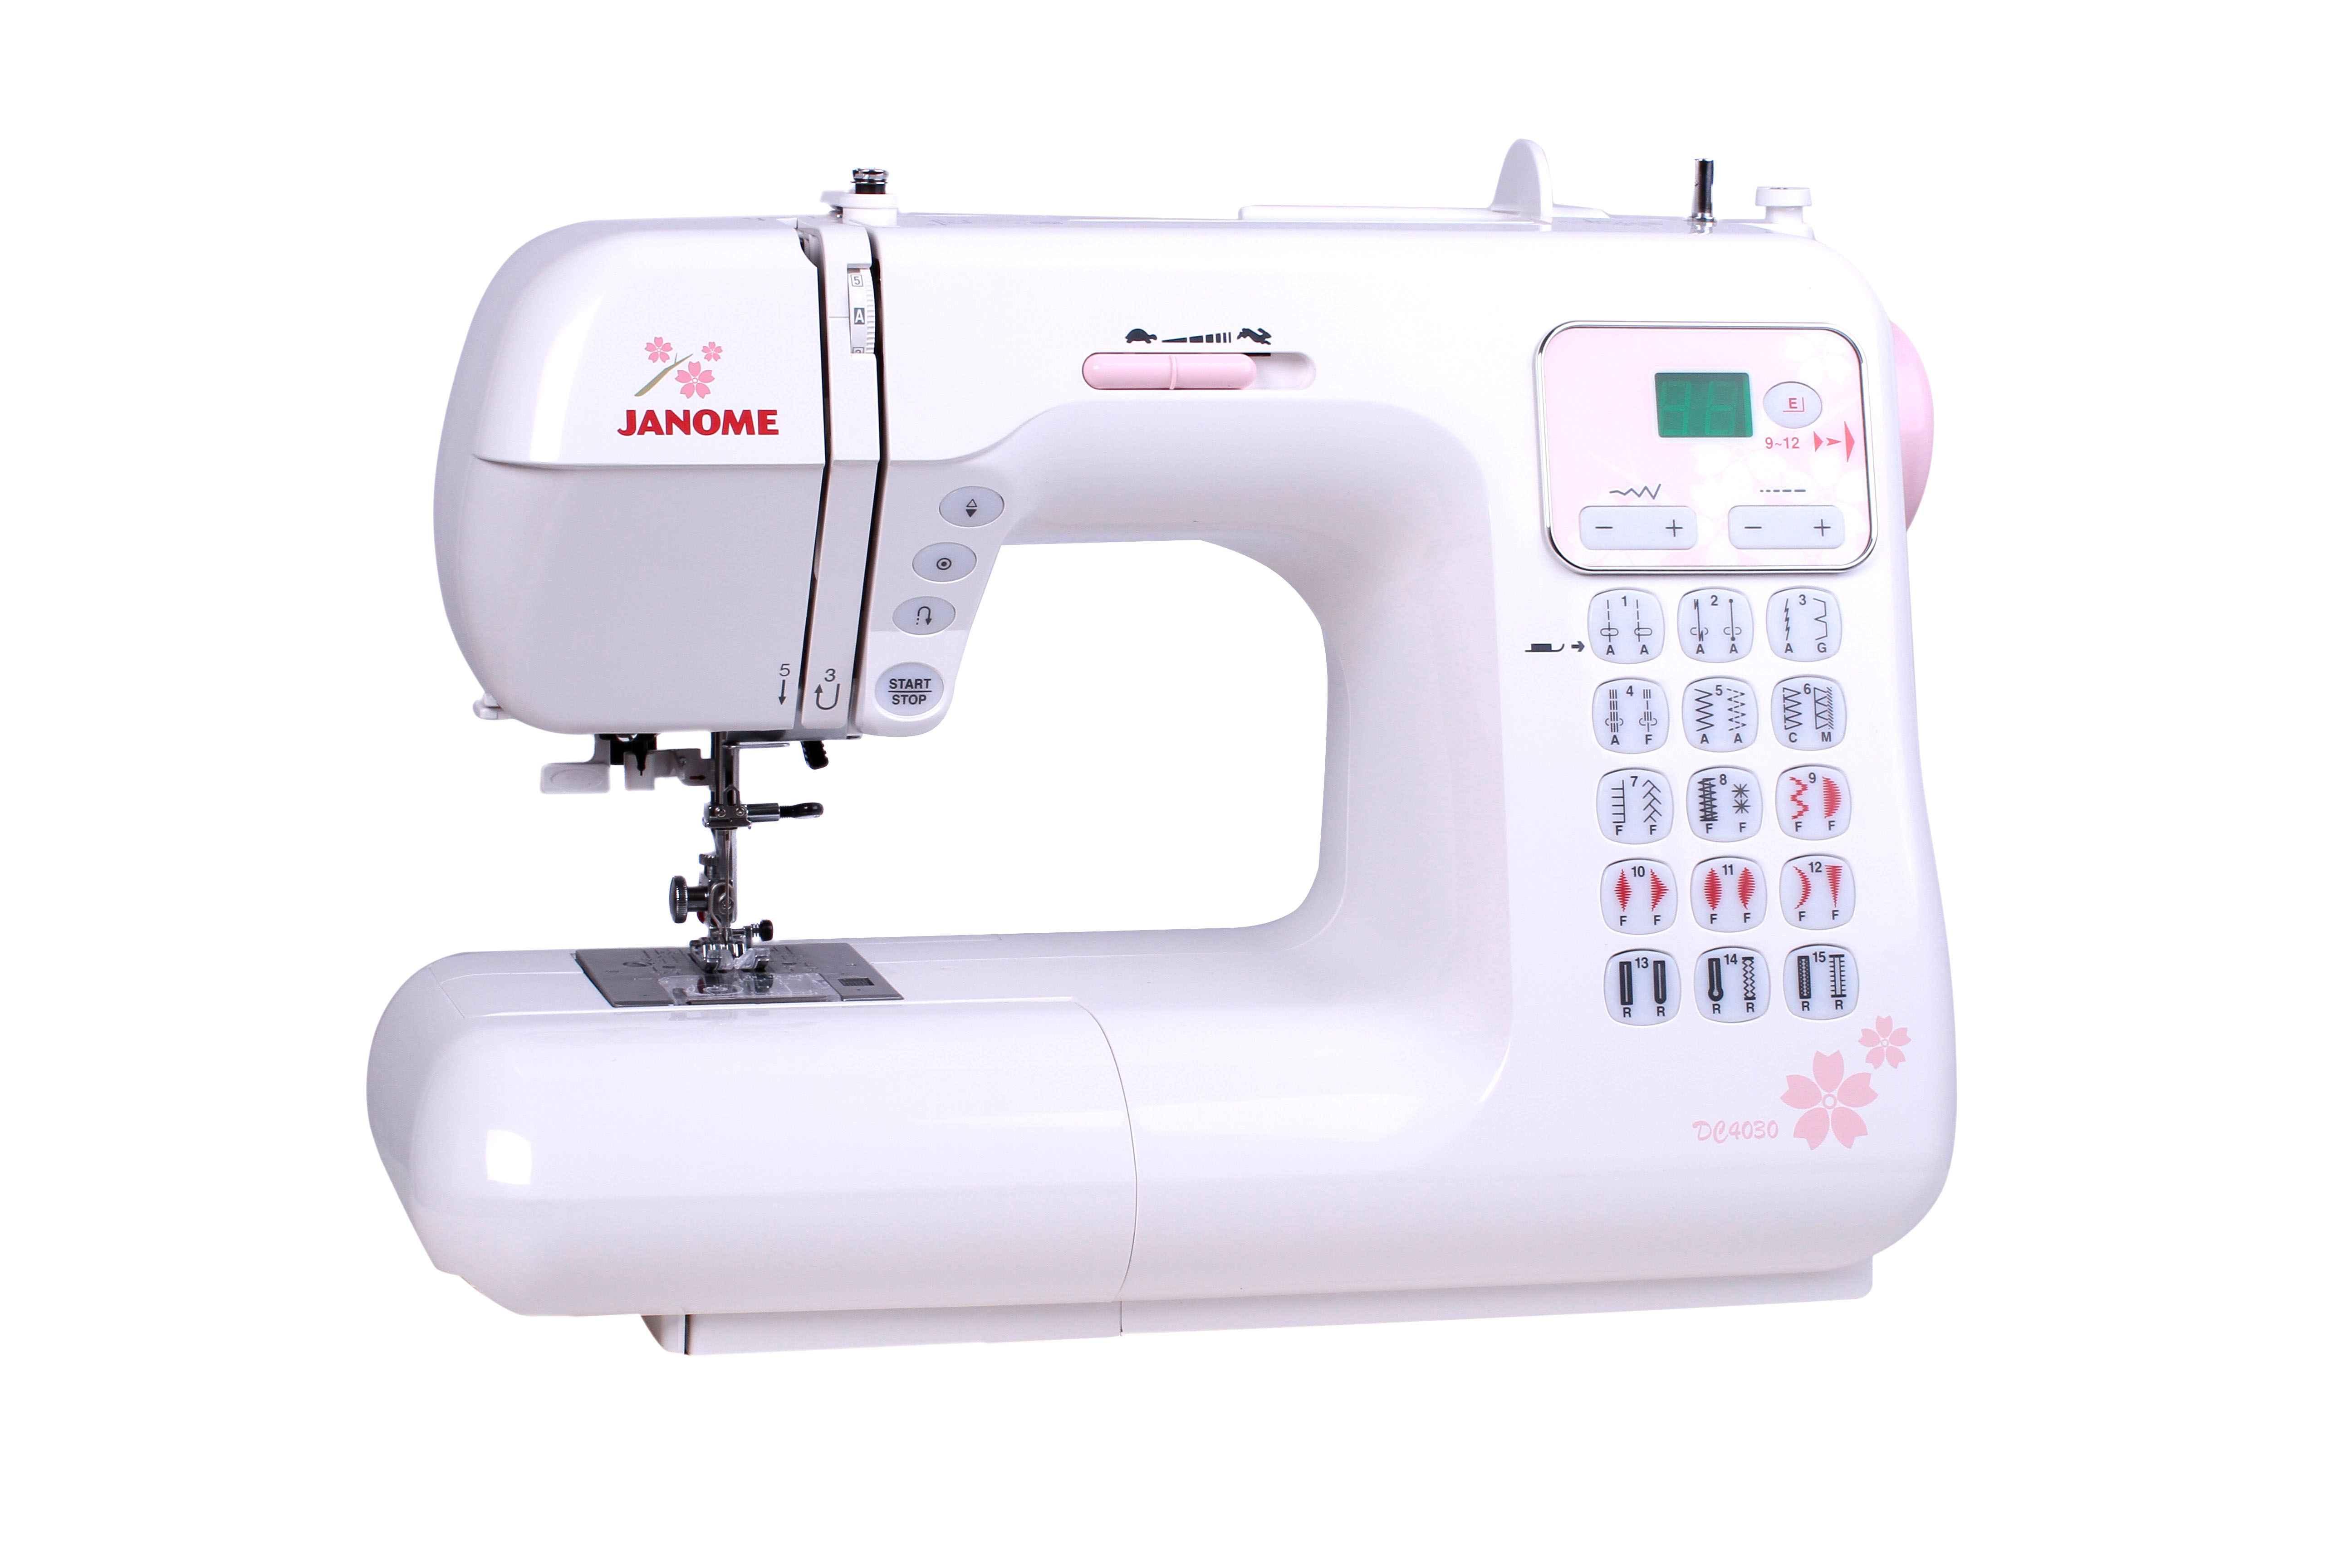 Швейная машина Janome Decor Computer 4030 (DC 4030) цена